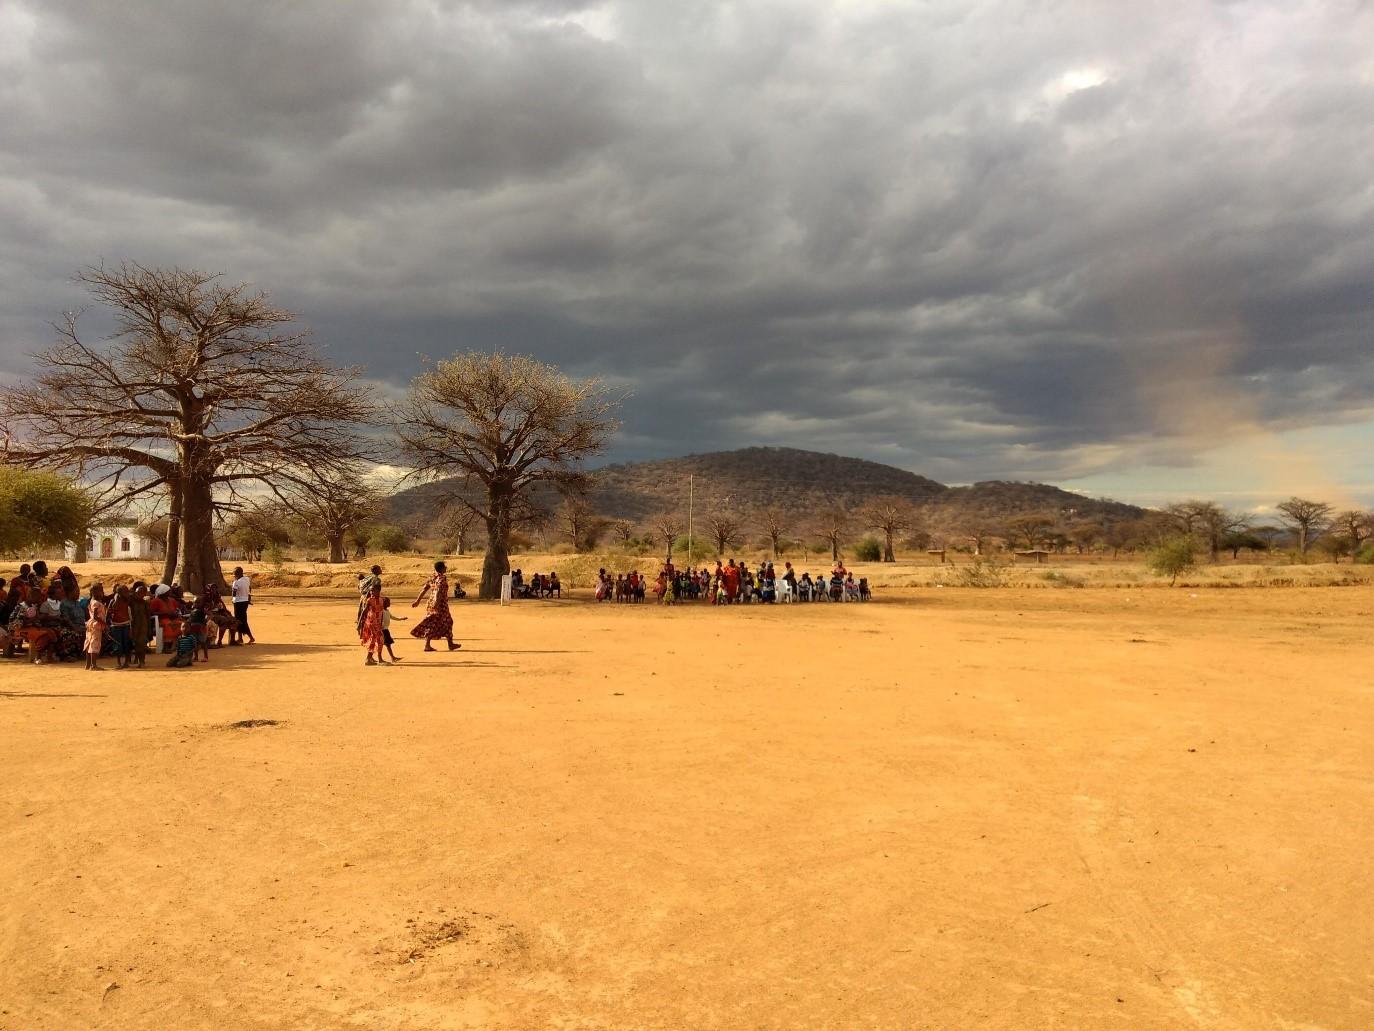 Dodoma, Tanzania. Photo by Pieter Bouwer on Unsplash